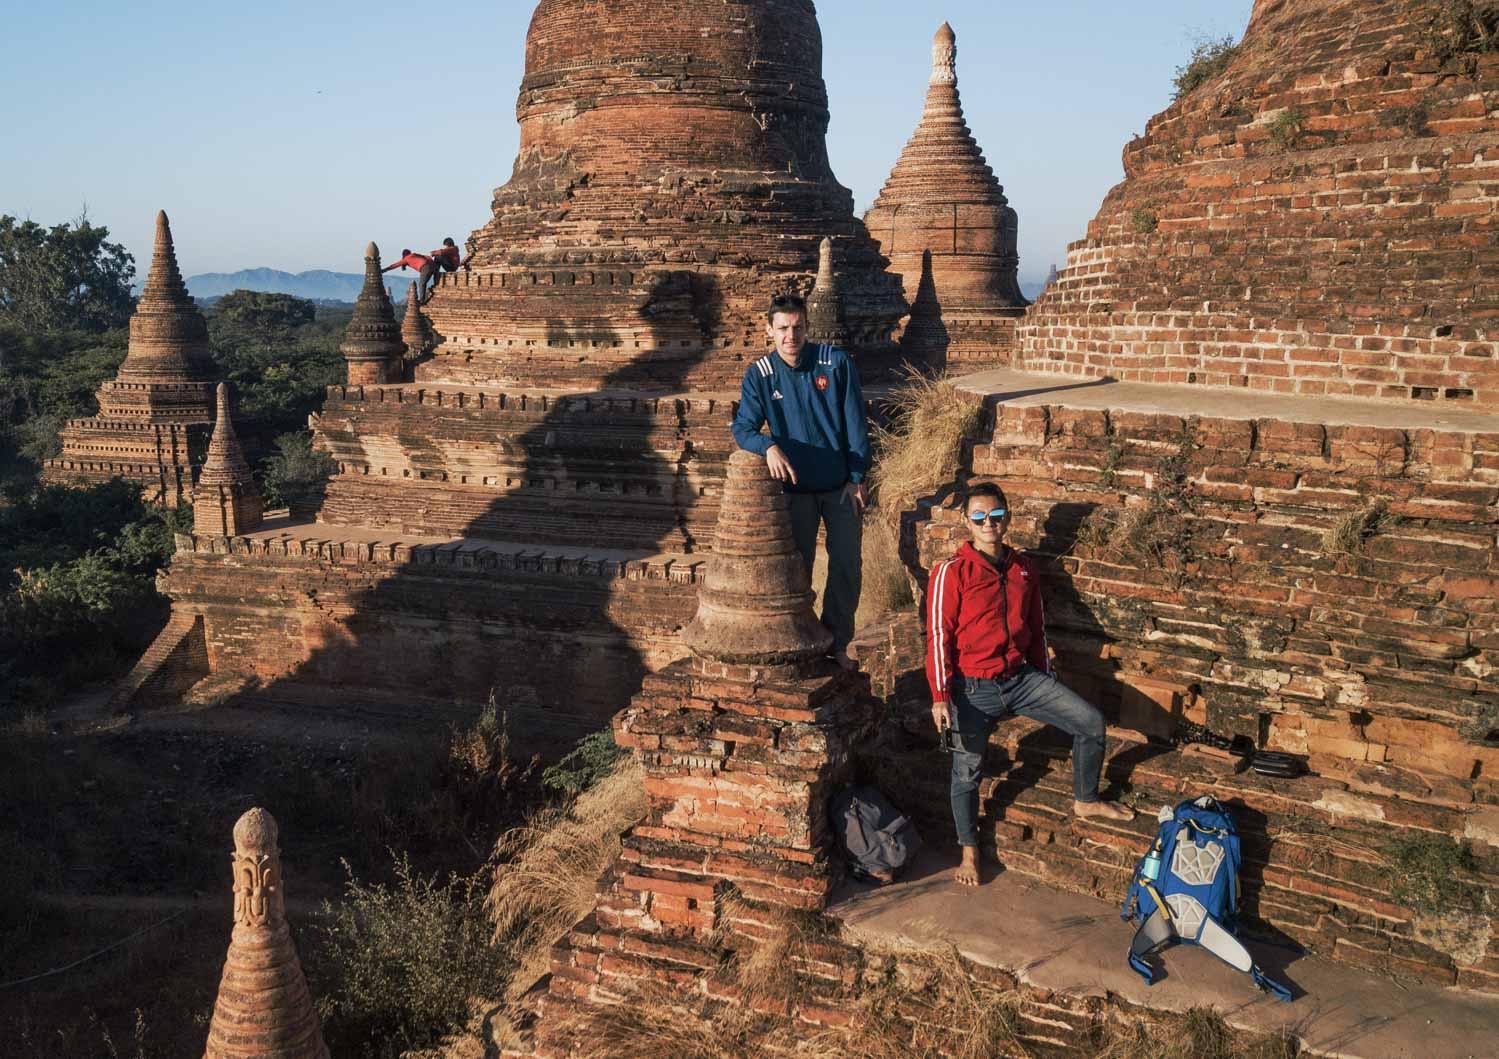 Blue and Red: Guys posing on Bagan stupa climb